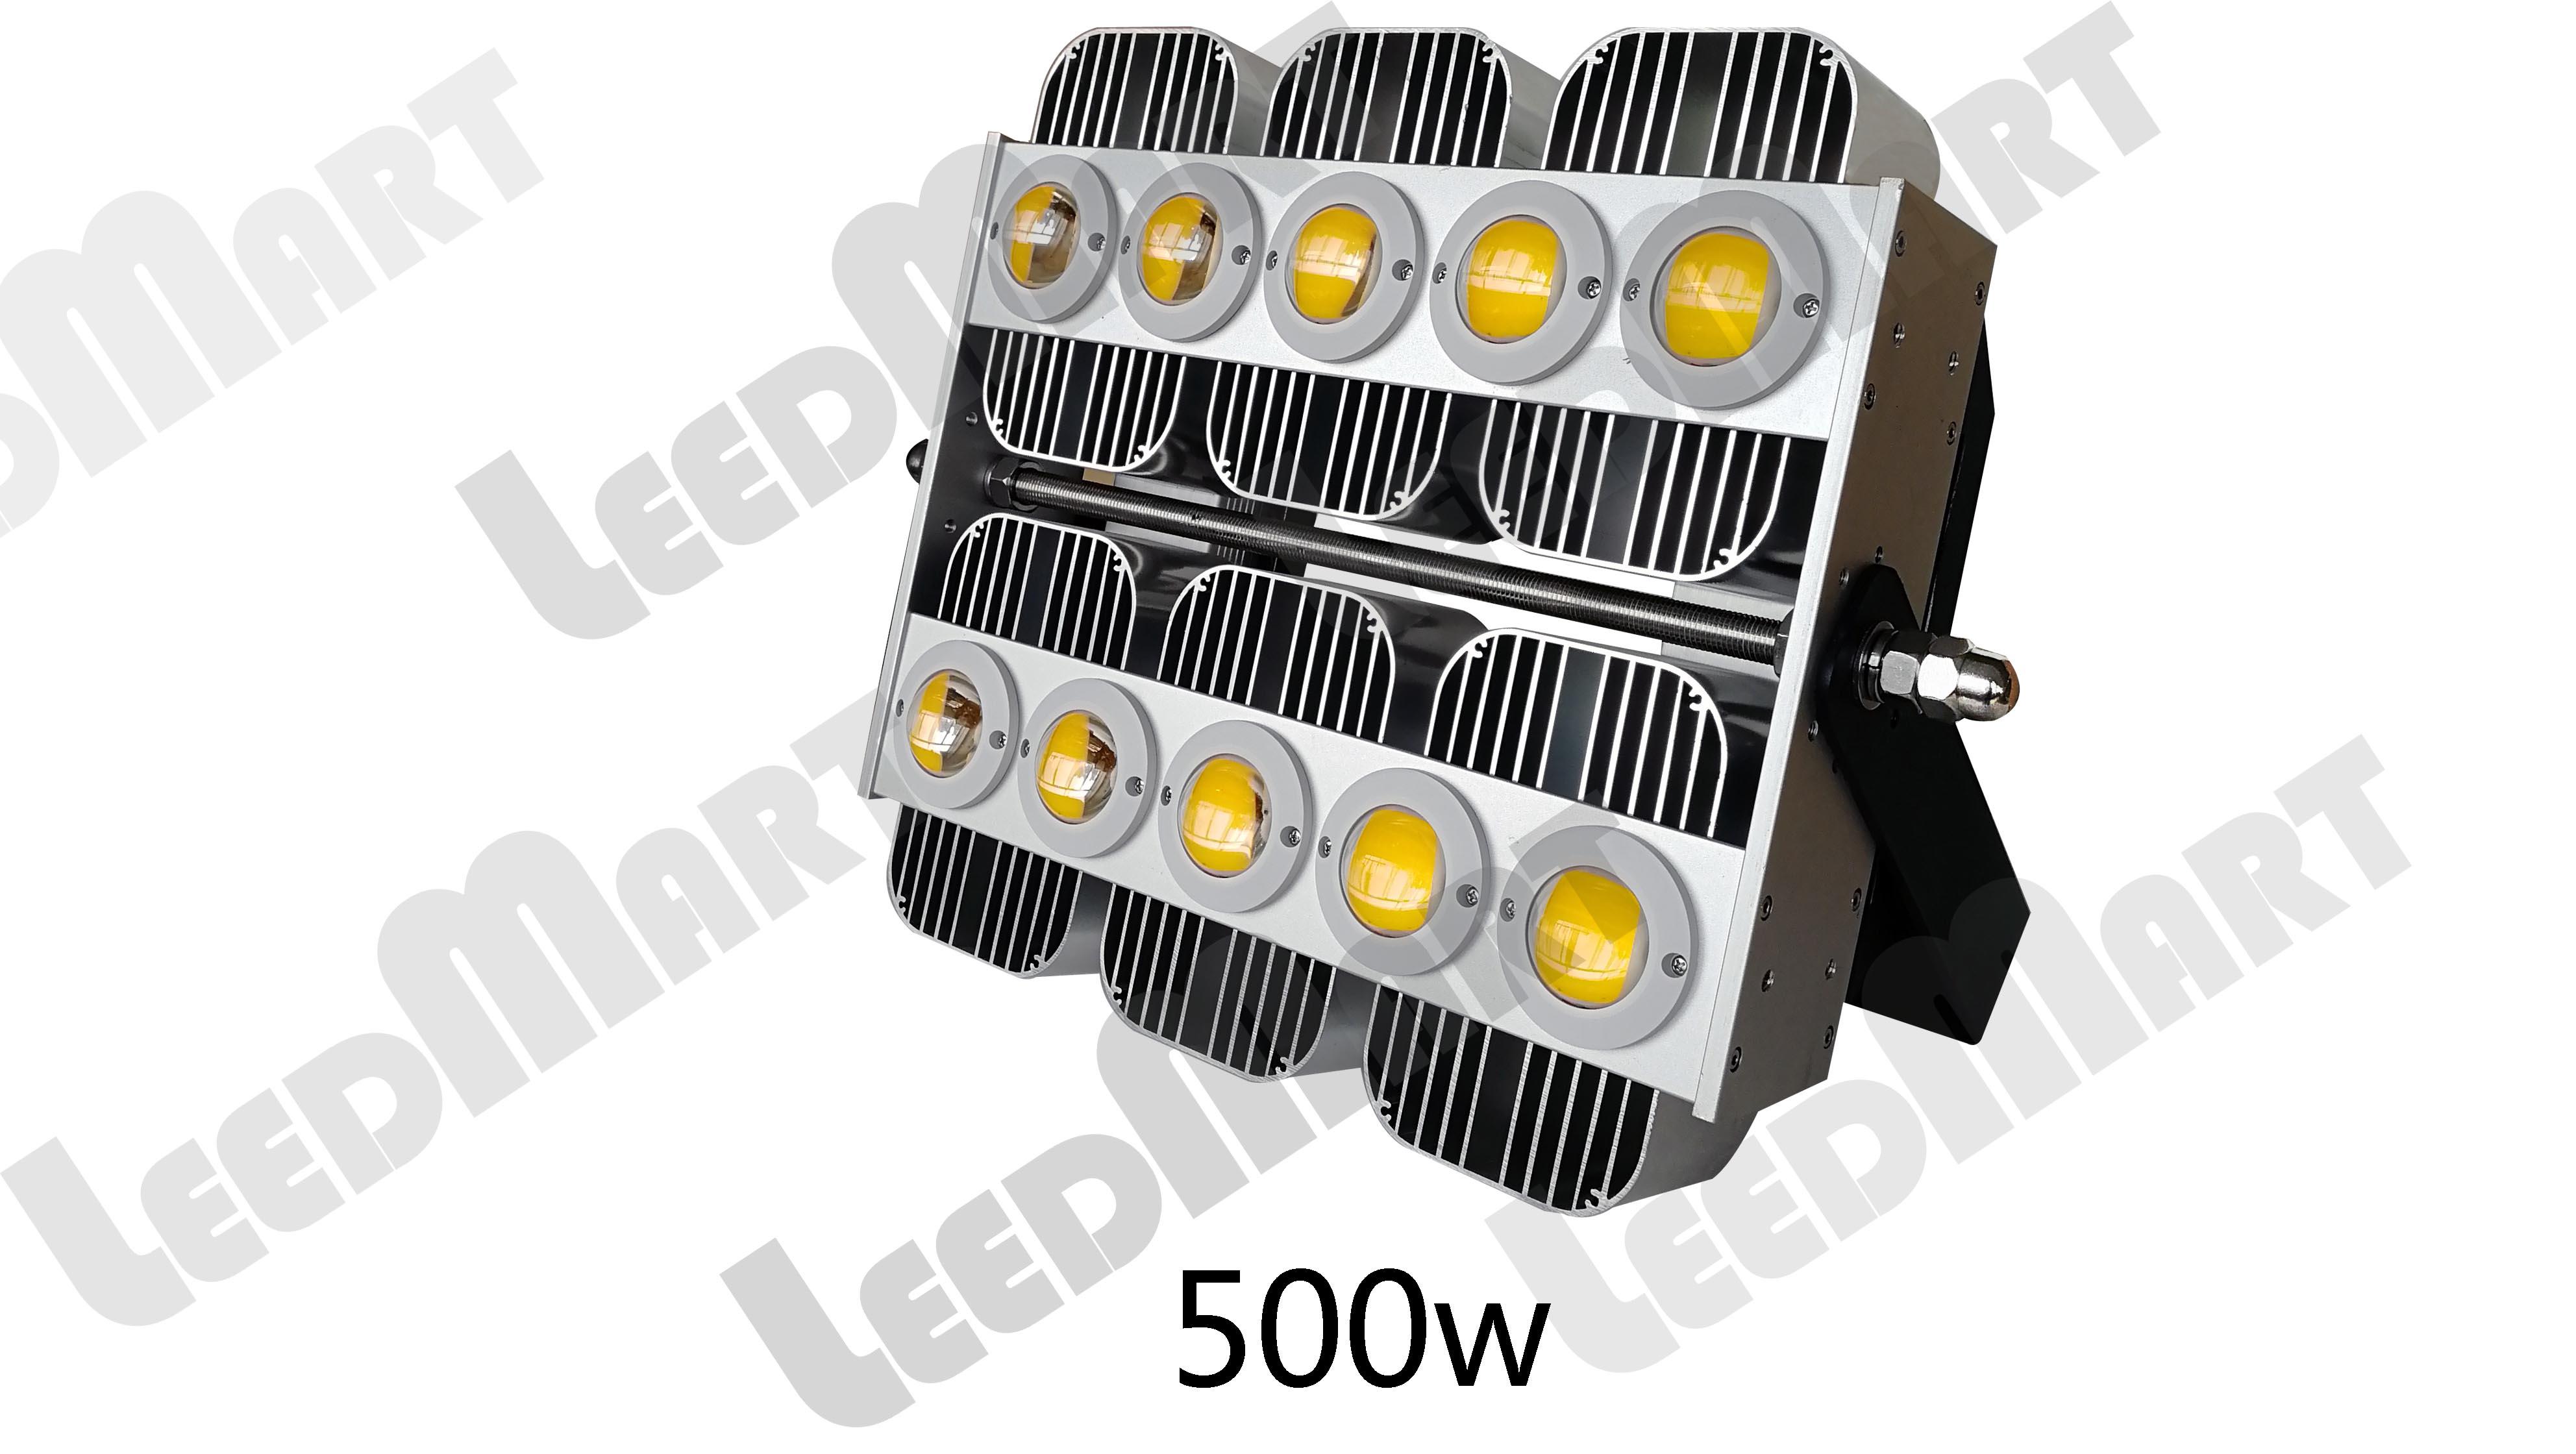 Dustproof good quality IP65 200 watt -1000 watt 130000 lumen LED high mast flood light fixture